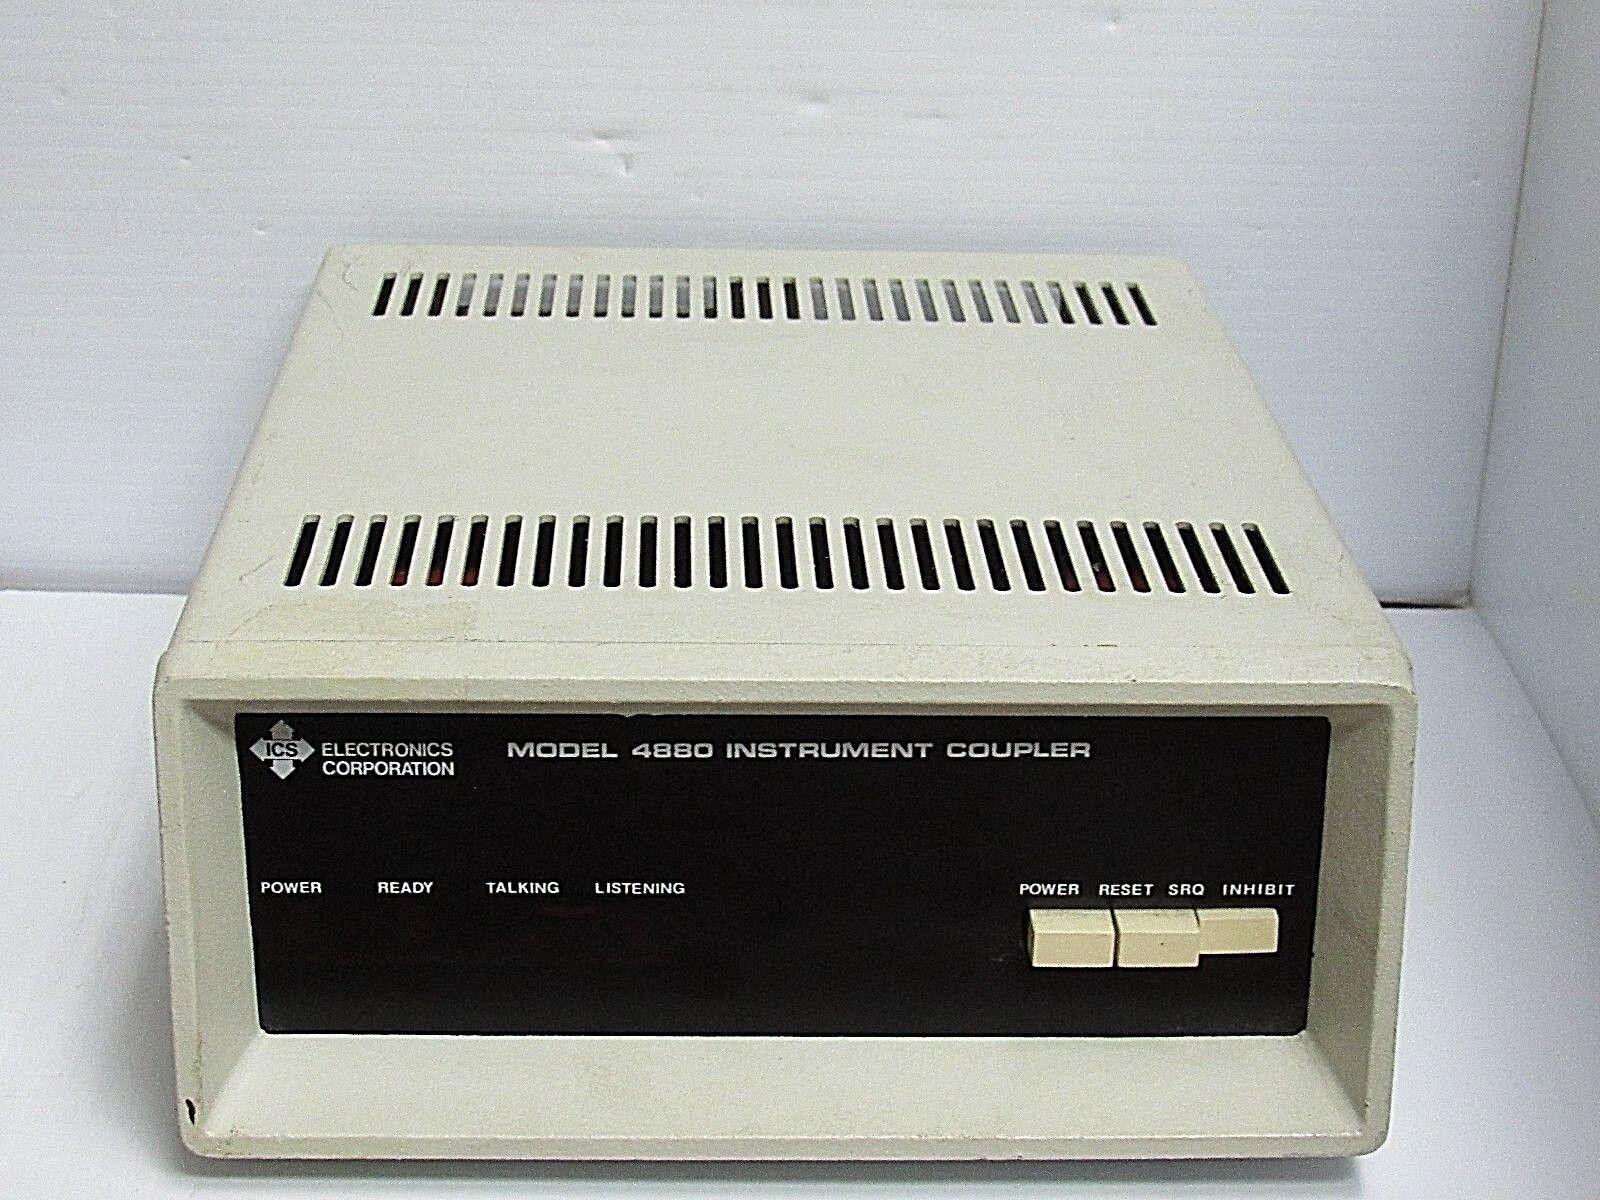 ICS ELECTRONICS CORP INSTRUMENT COUPLER 4880 4881 REV. 24